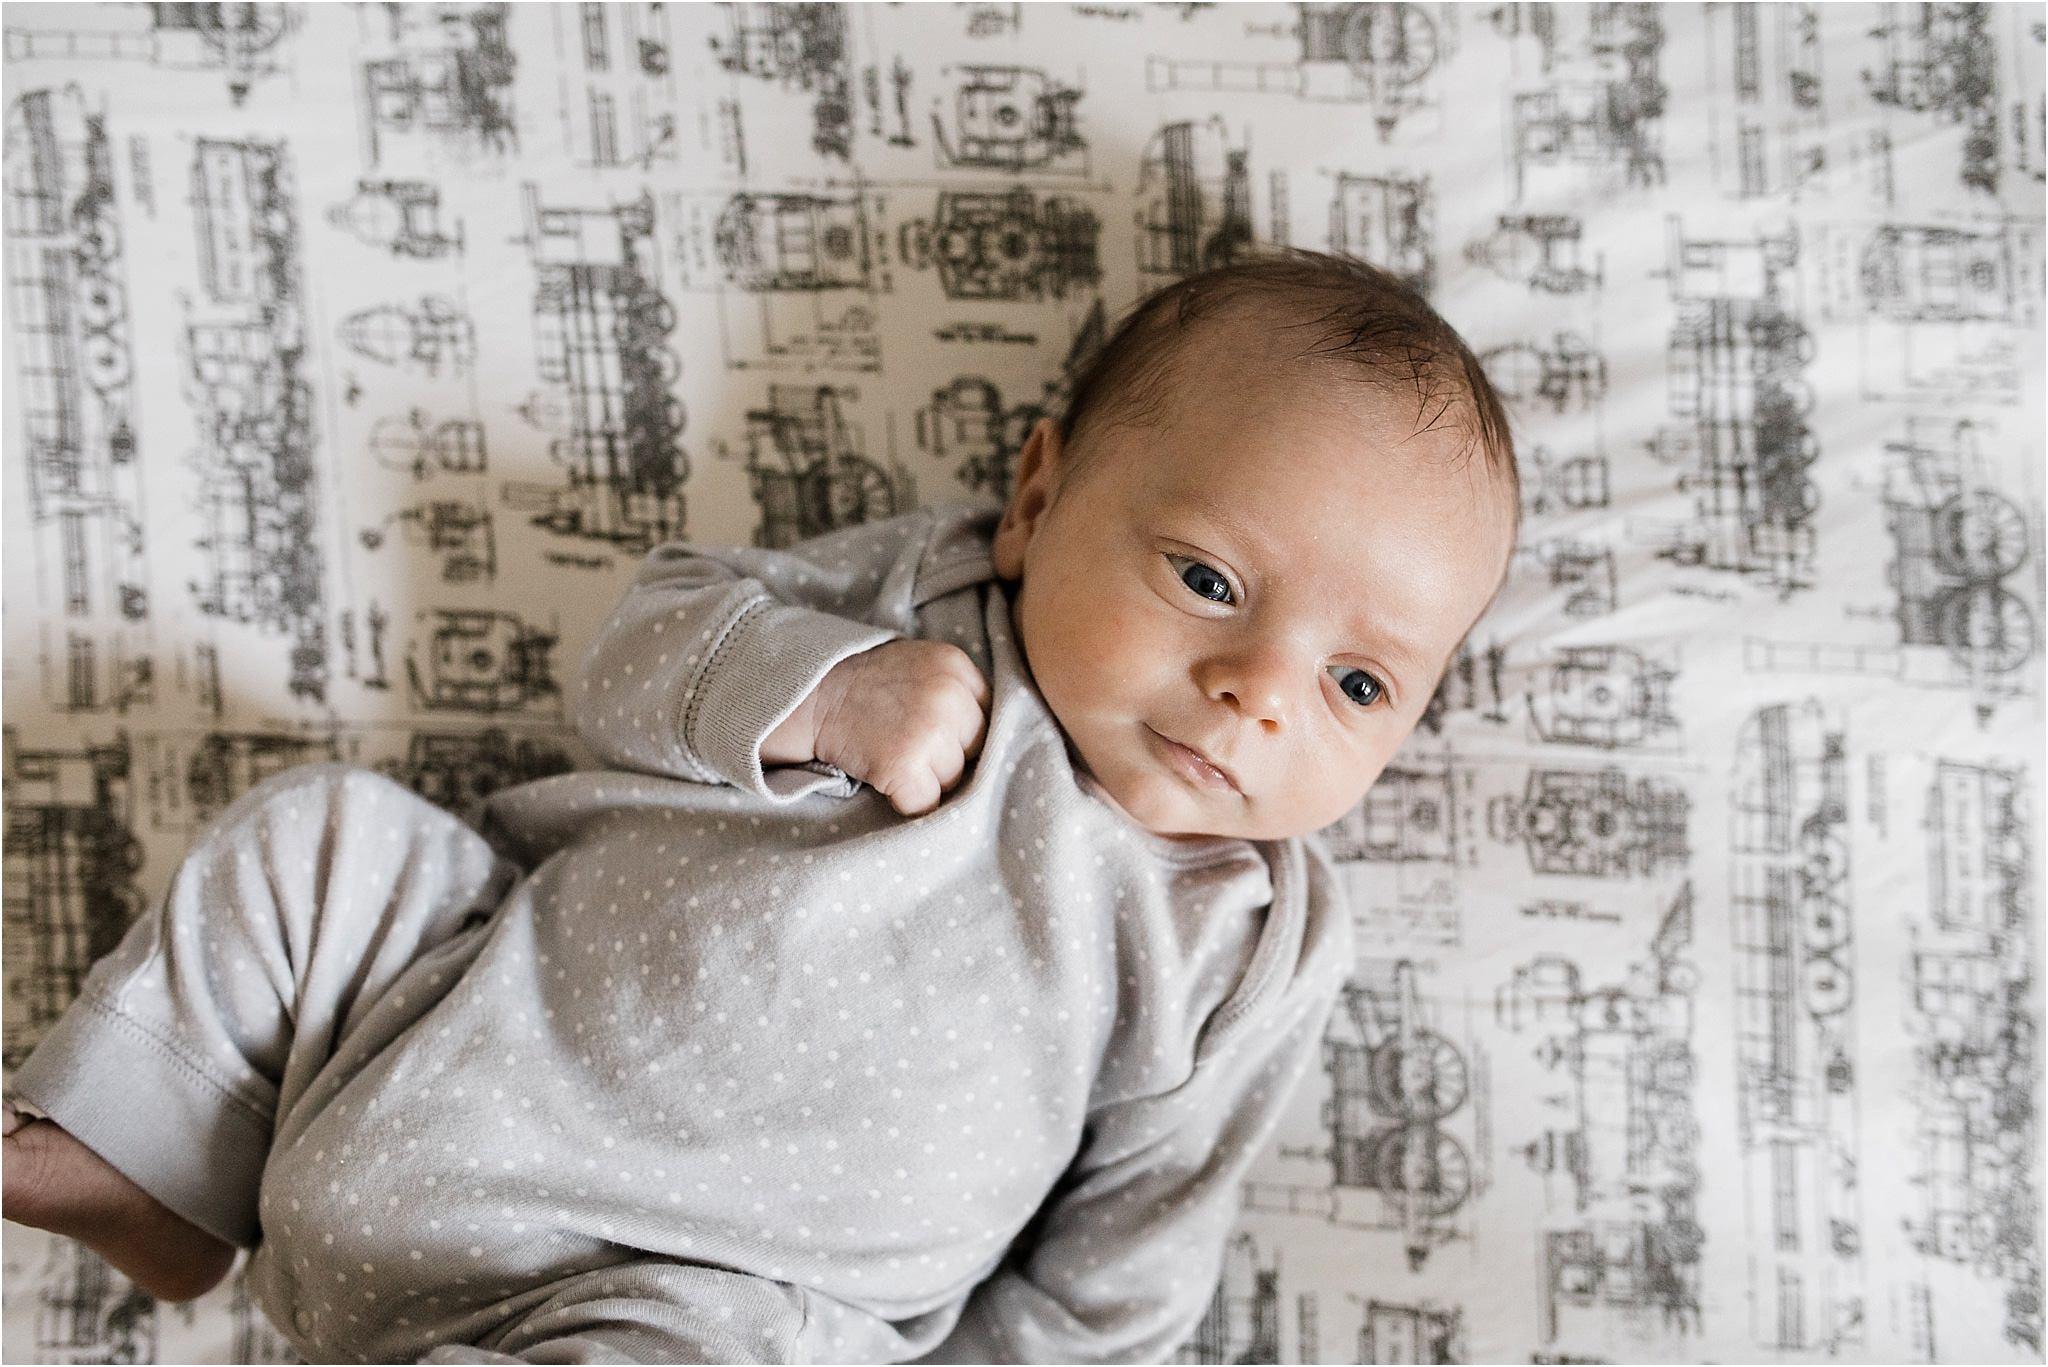 newborn baby boy in crib with train sheets